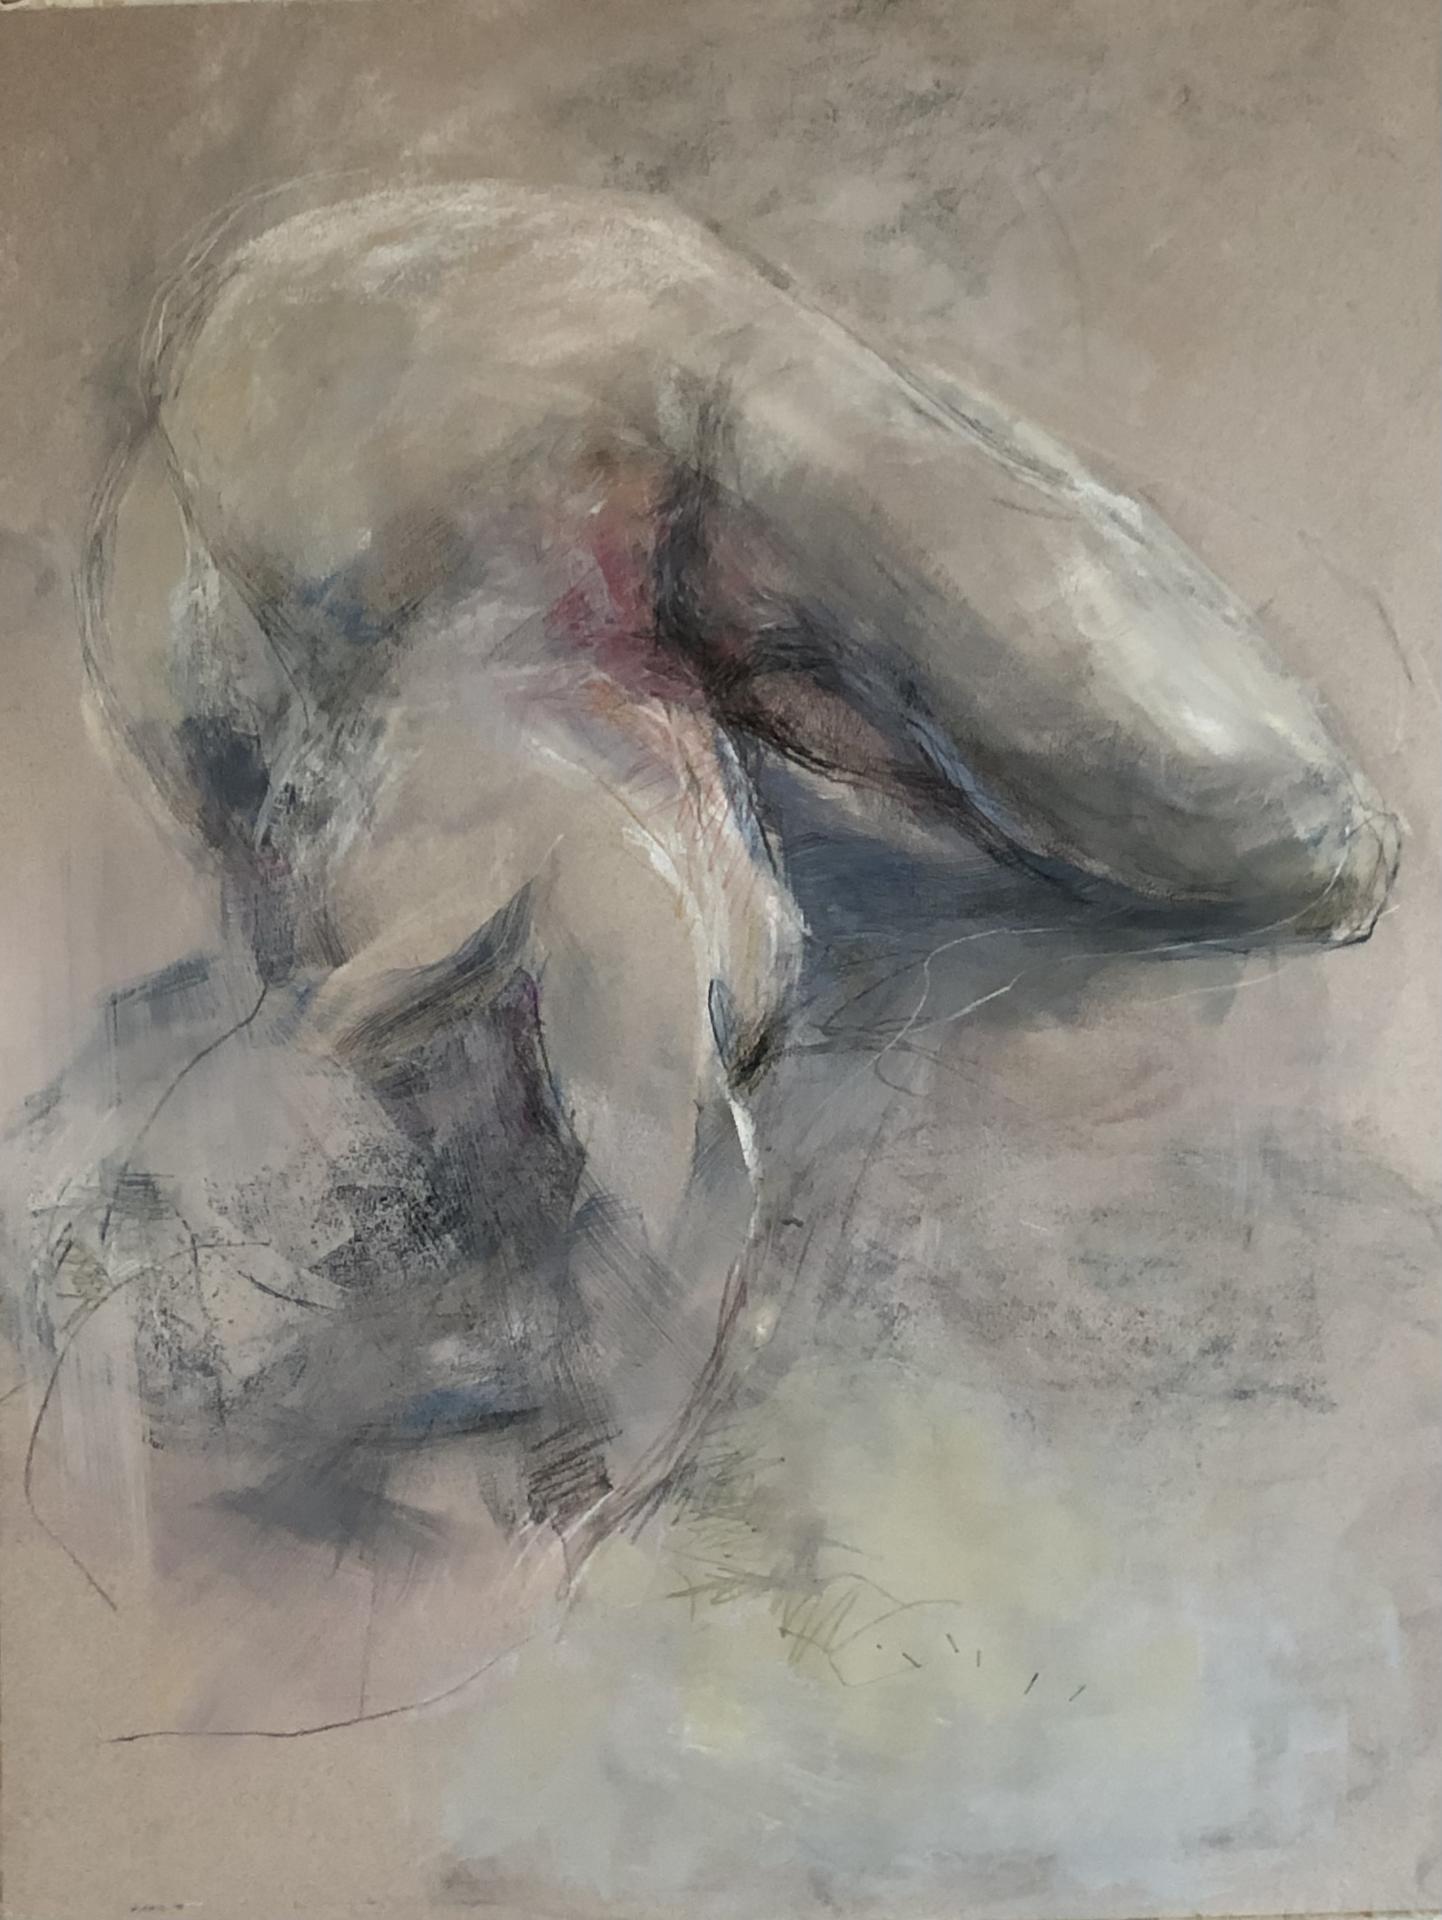 70 x 50 cm (chalks on paper)